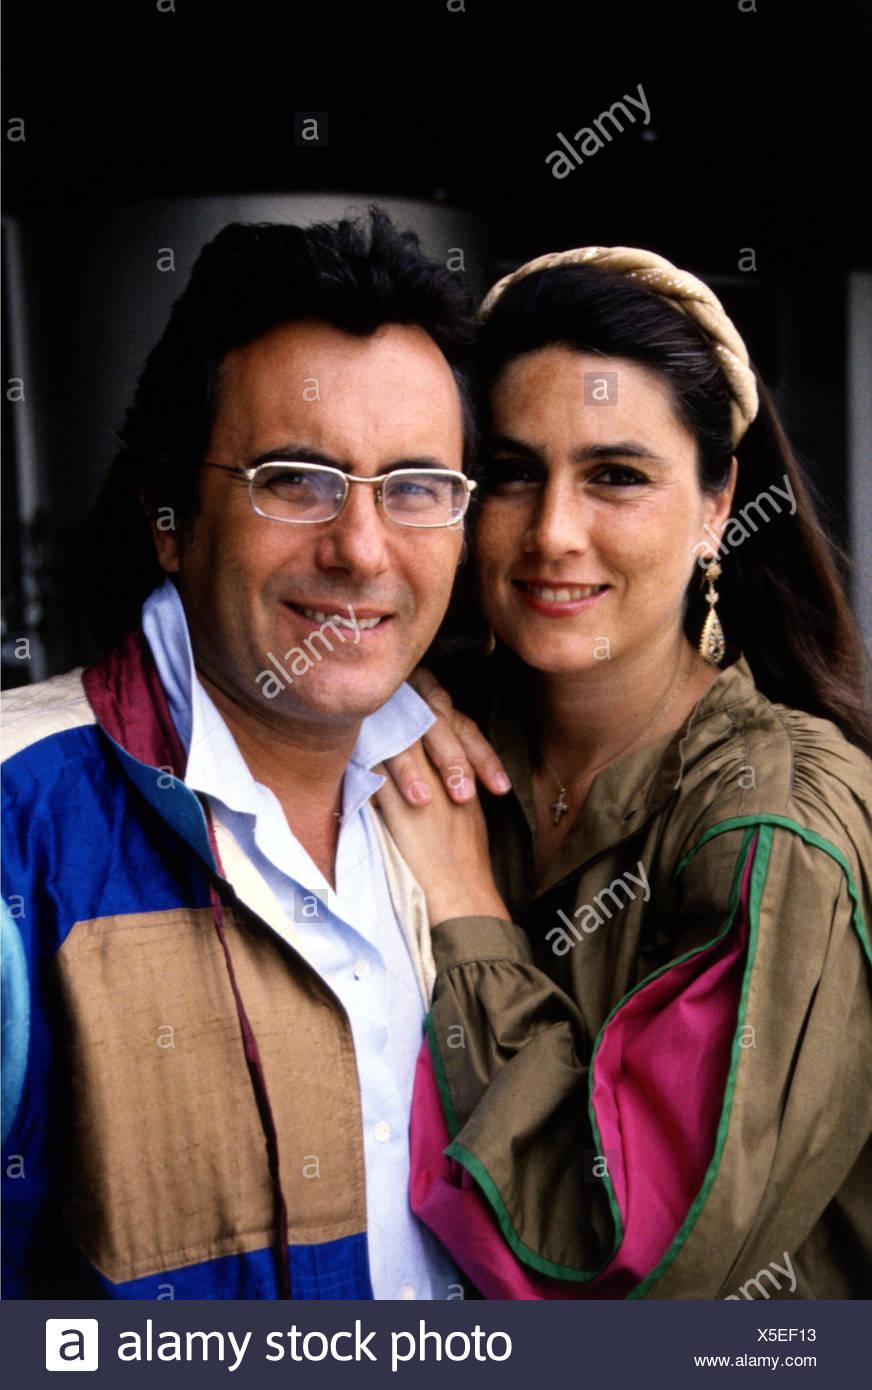 Power, Al Bano & Romina, 1970 - 1996, Italian pop duo, (Albano Carrisi and Romina Francesca Power), portrait, 1980s, singer, sin - Stock Image